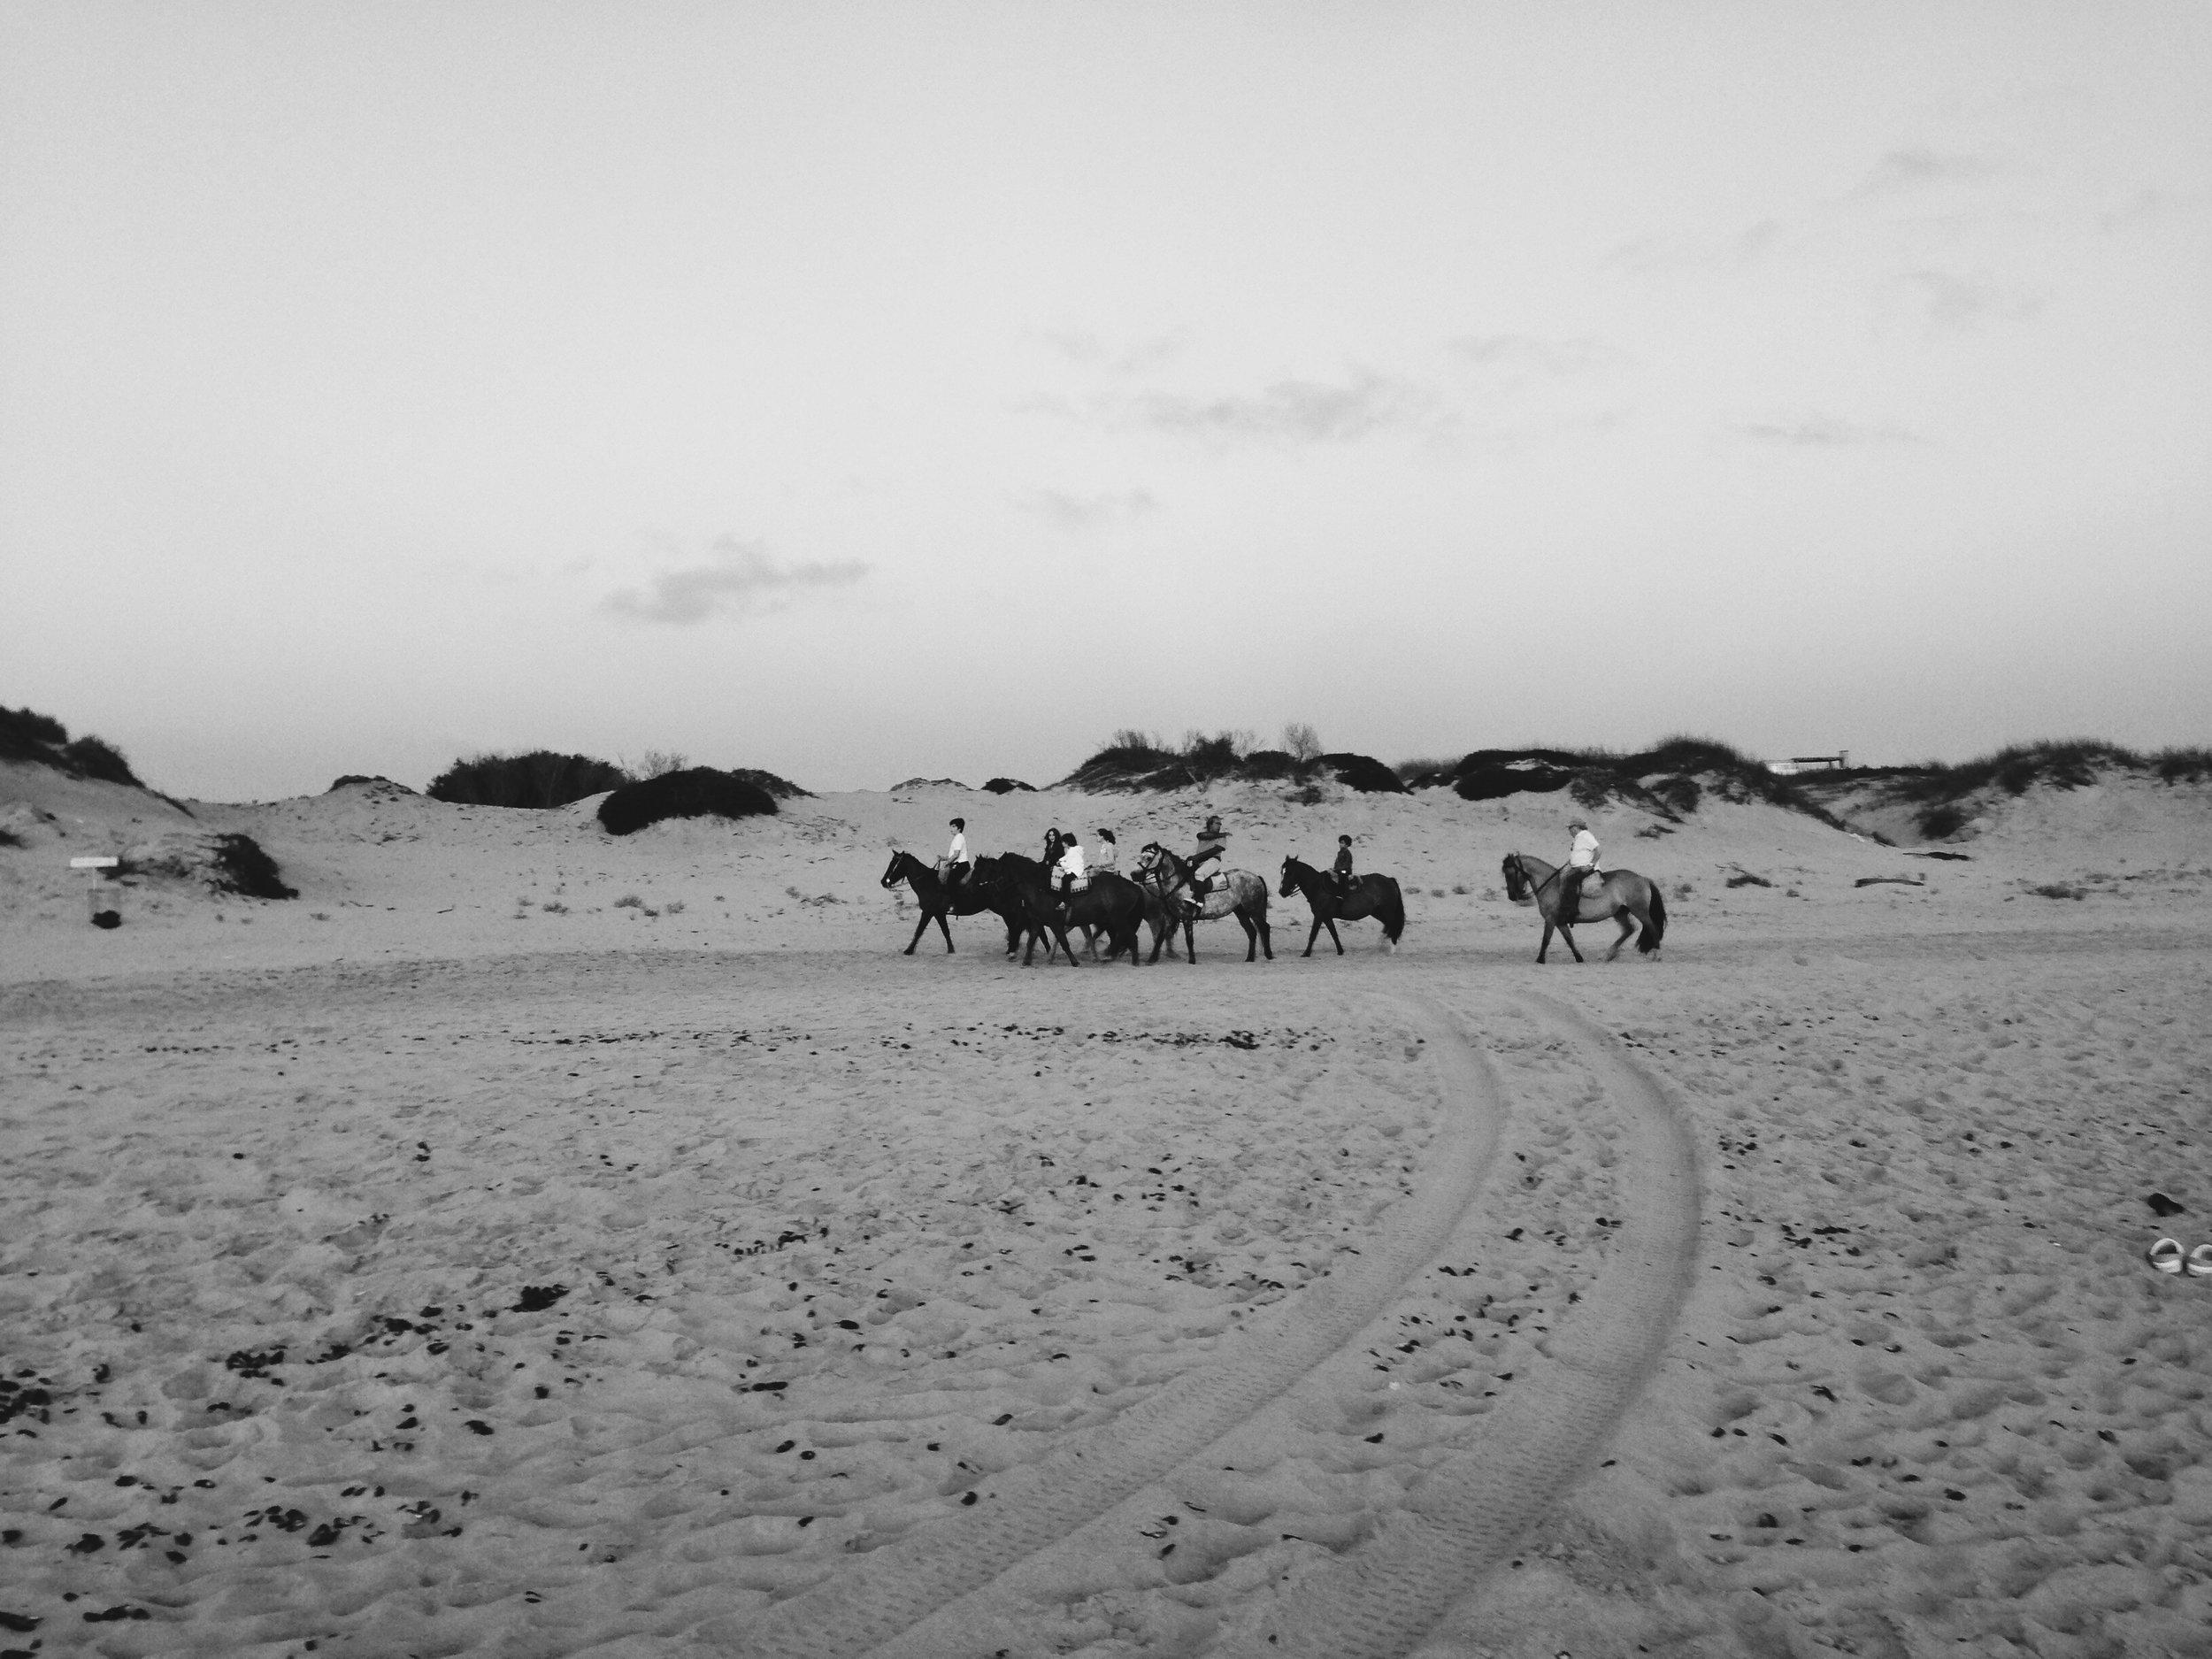 Riders at dusk on Playa Mansa